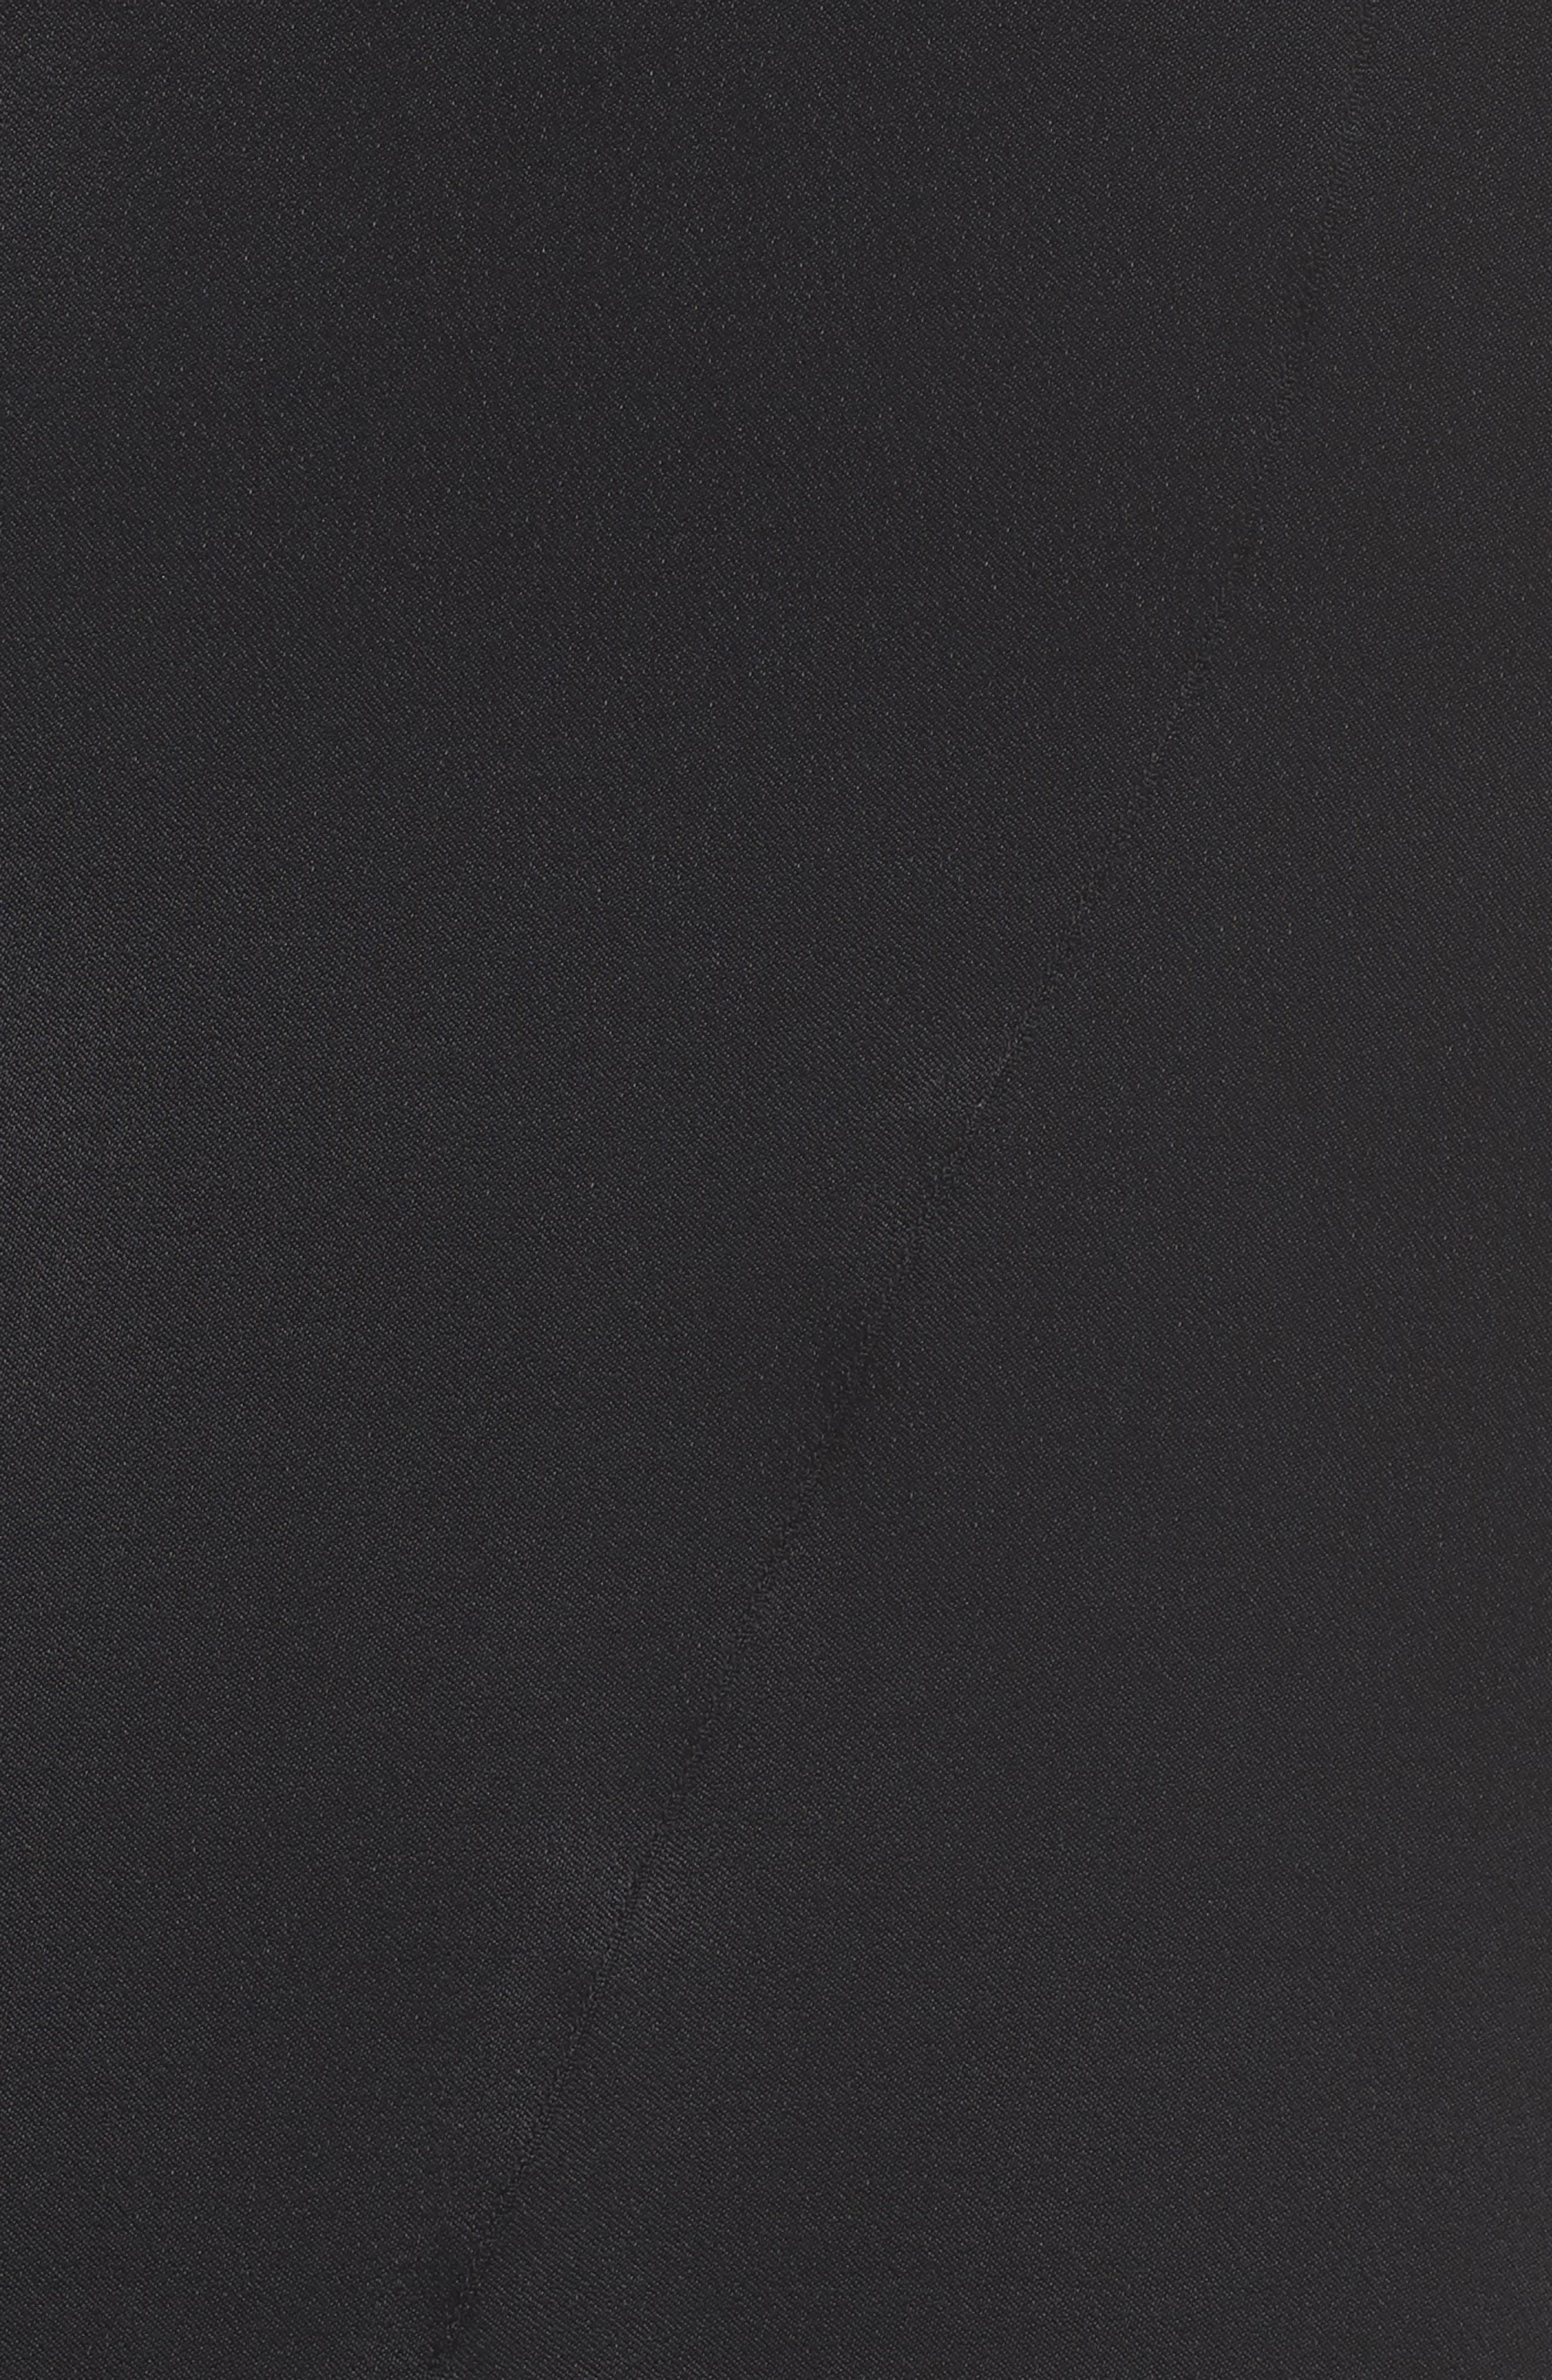 Lace Trim Slip Skirt,                             Alternate thumbnail 6, color,                             Black